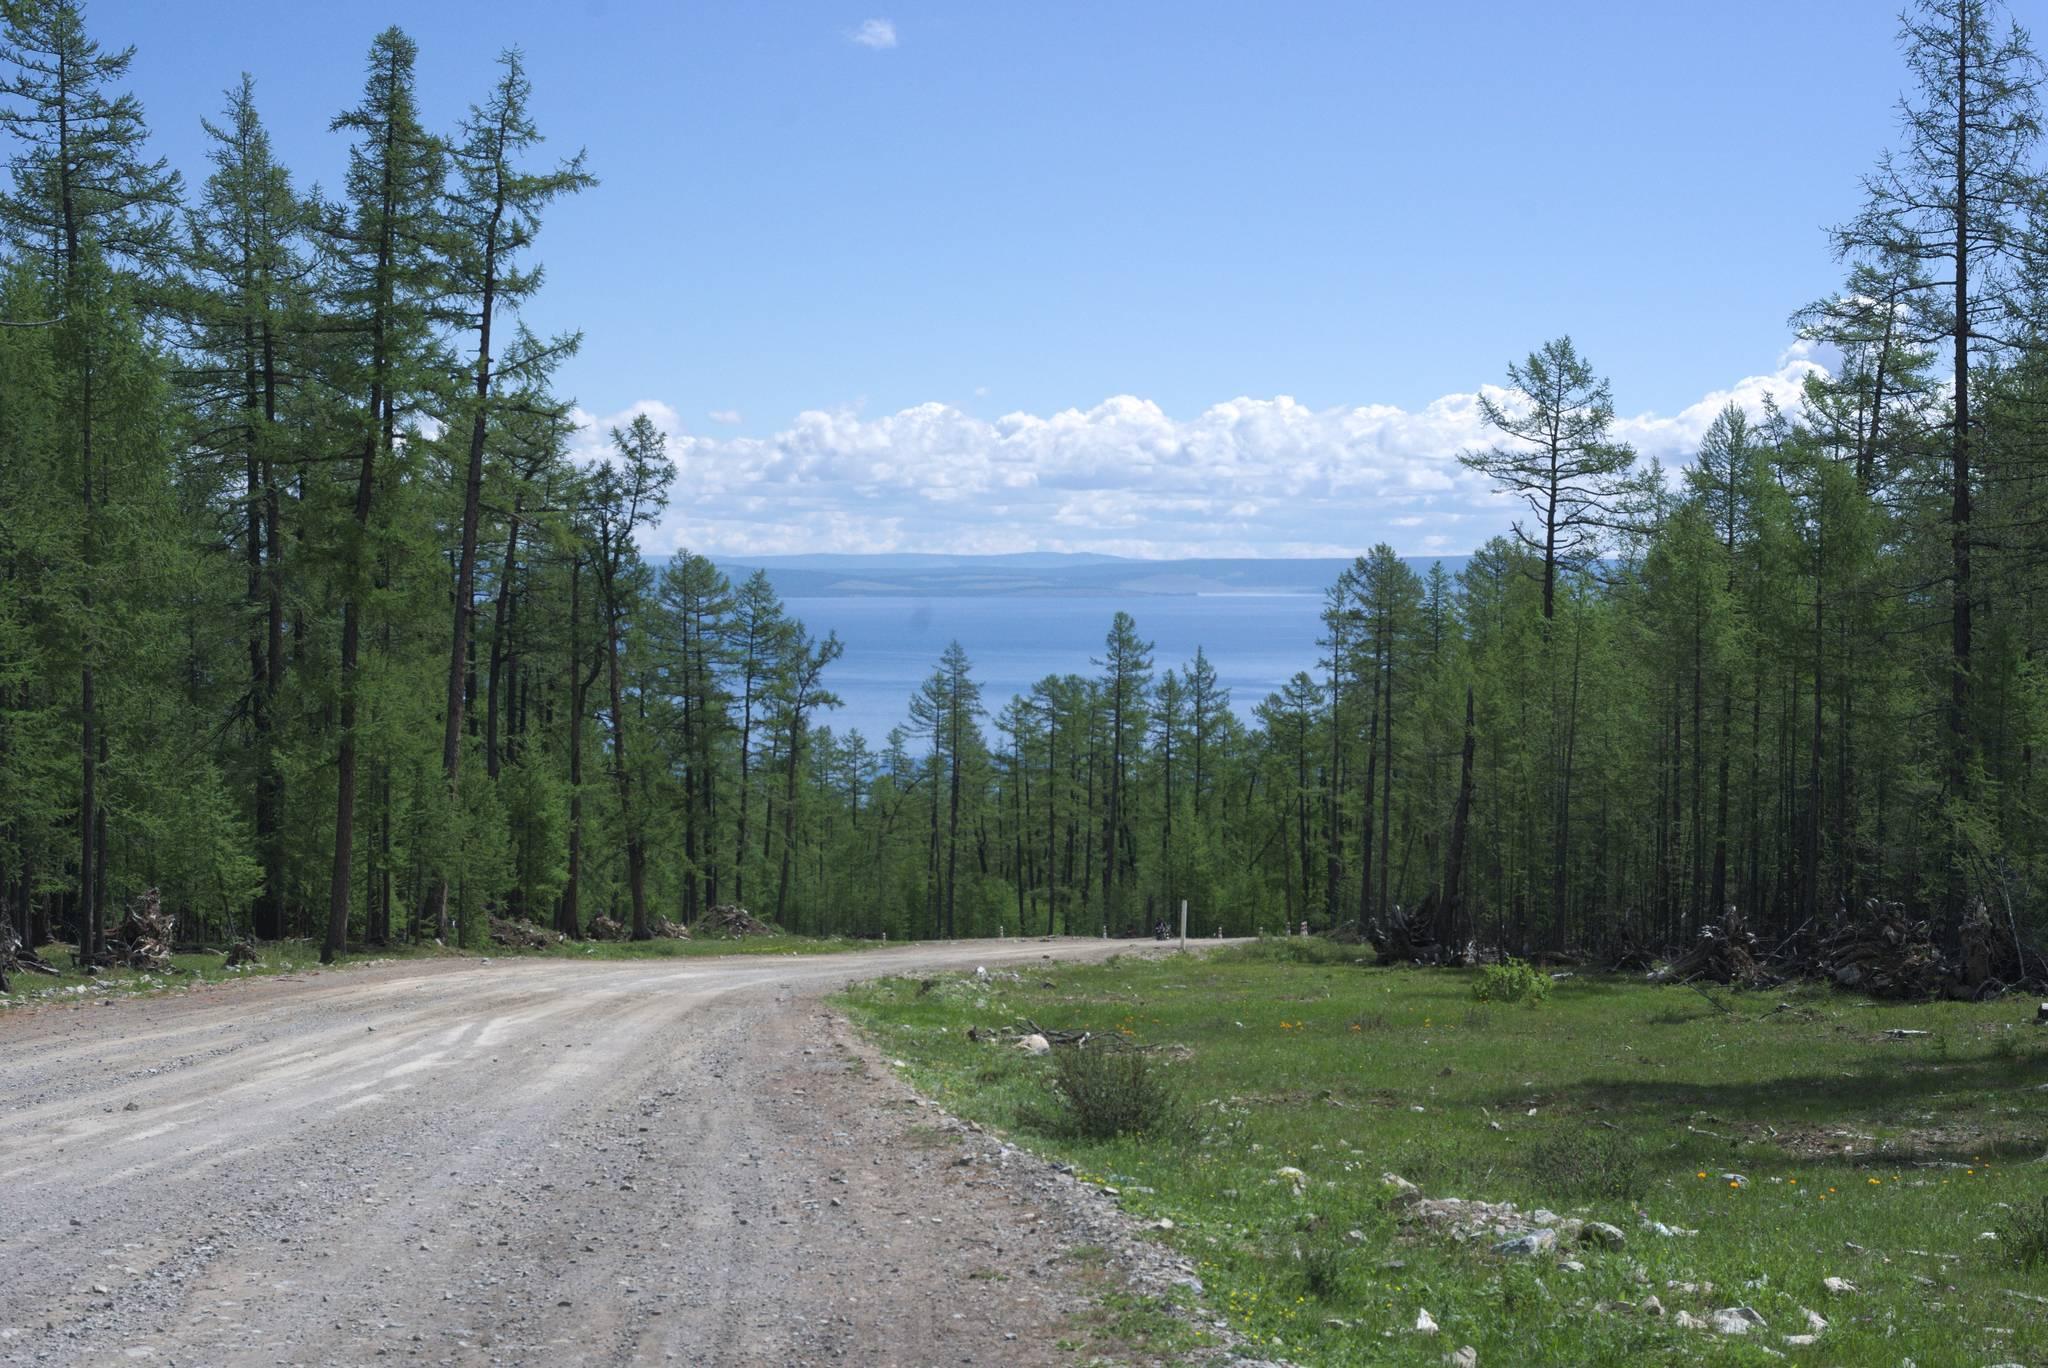 A po drugiej stronie jezioro Hovsgol